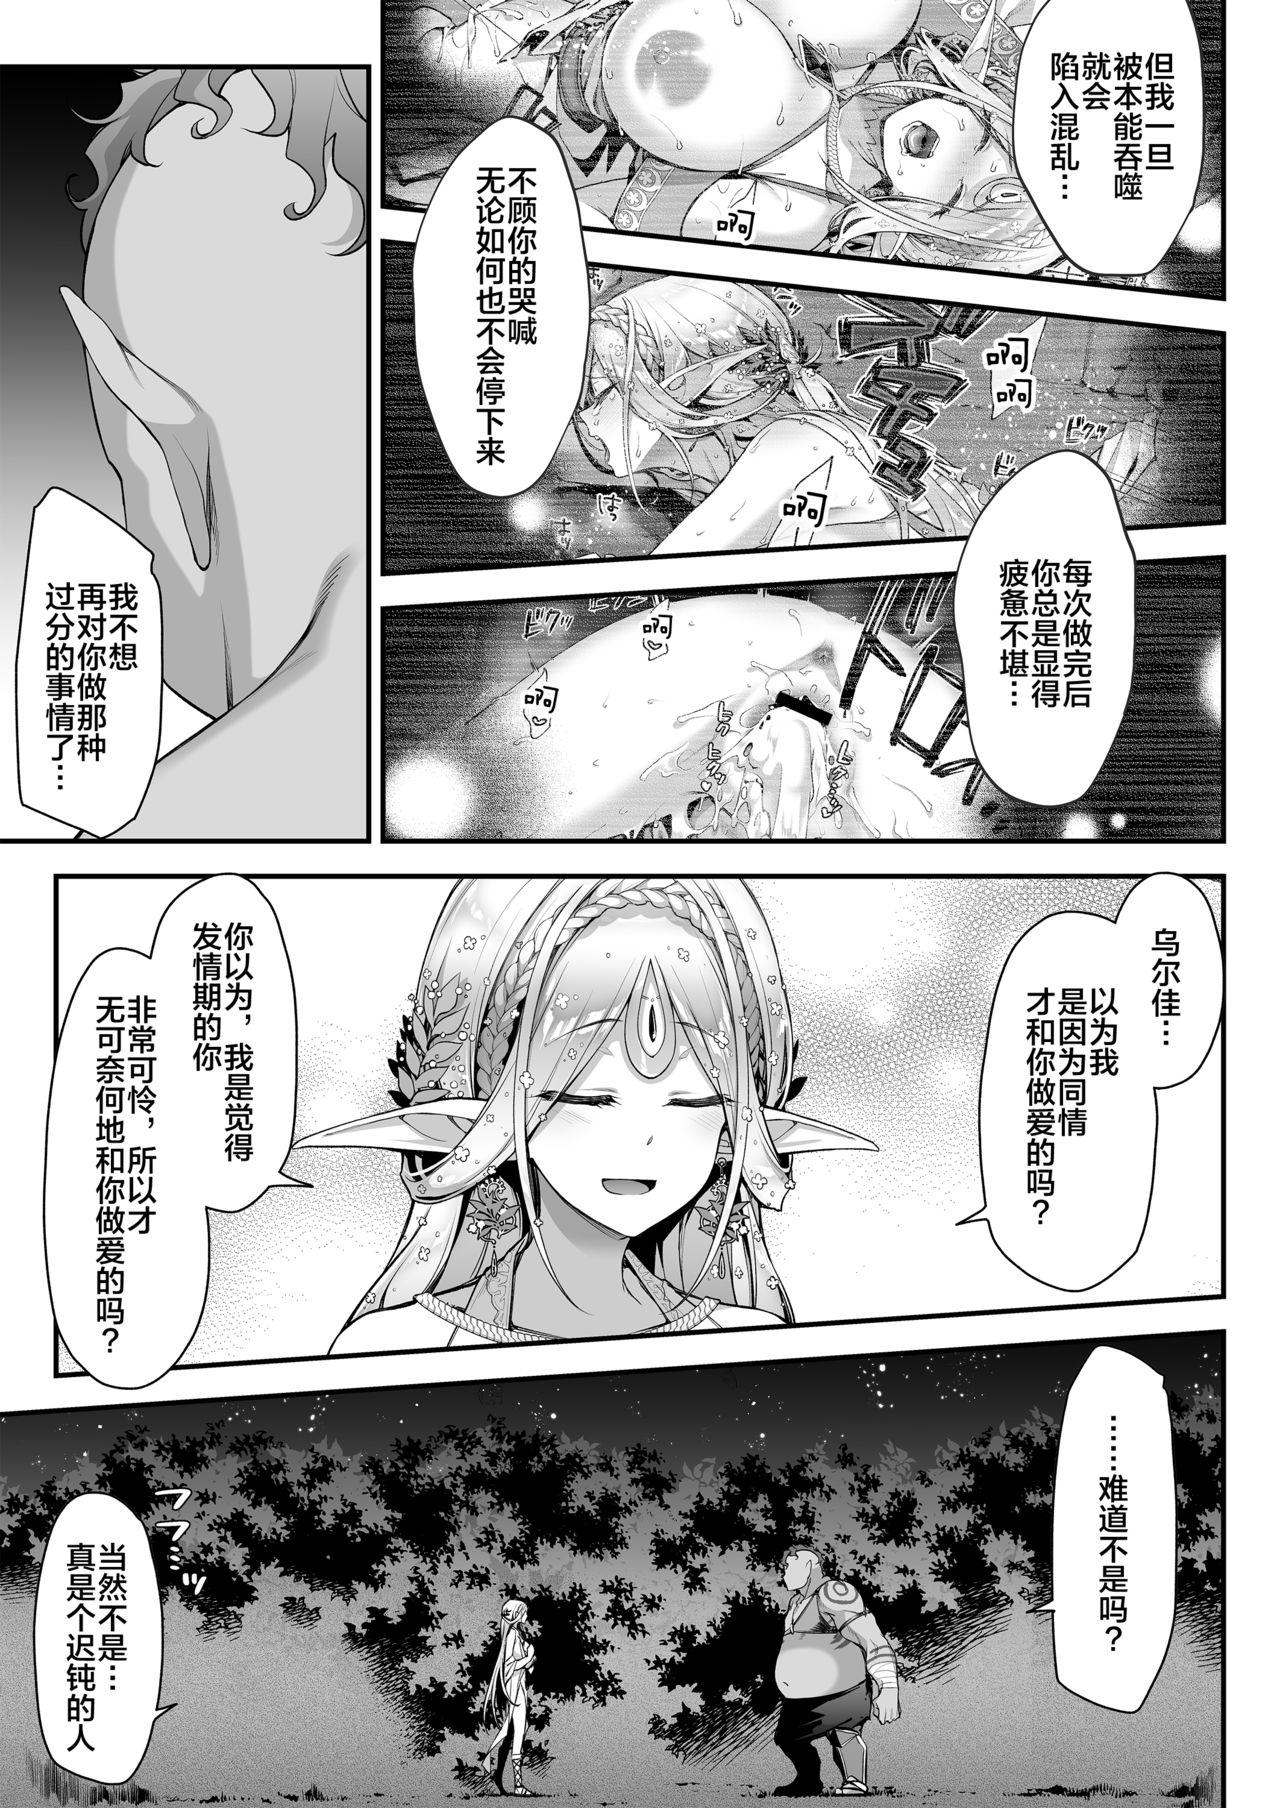 [Ichinose Land] Midara na Elf-san wa Orc-kun ga Osuki [Chinese] [新桥月白日语社] [Digital] 17